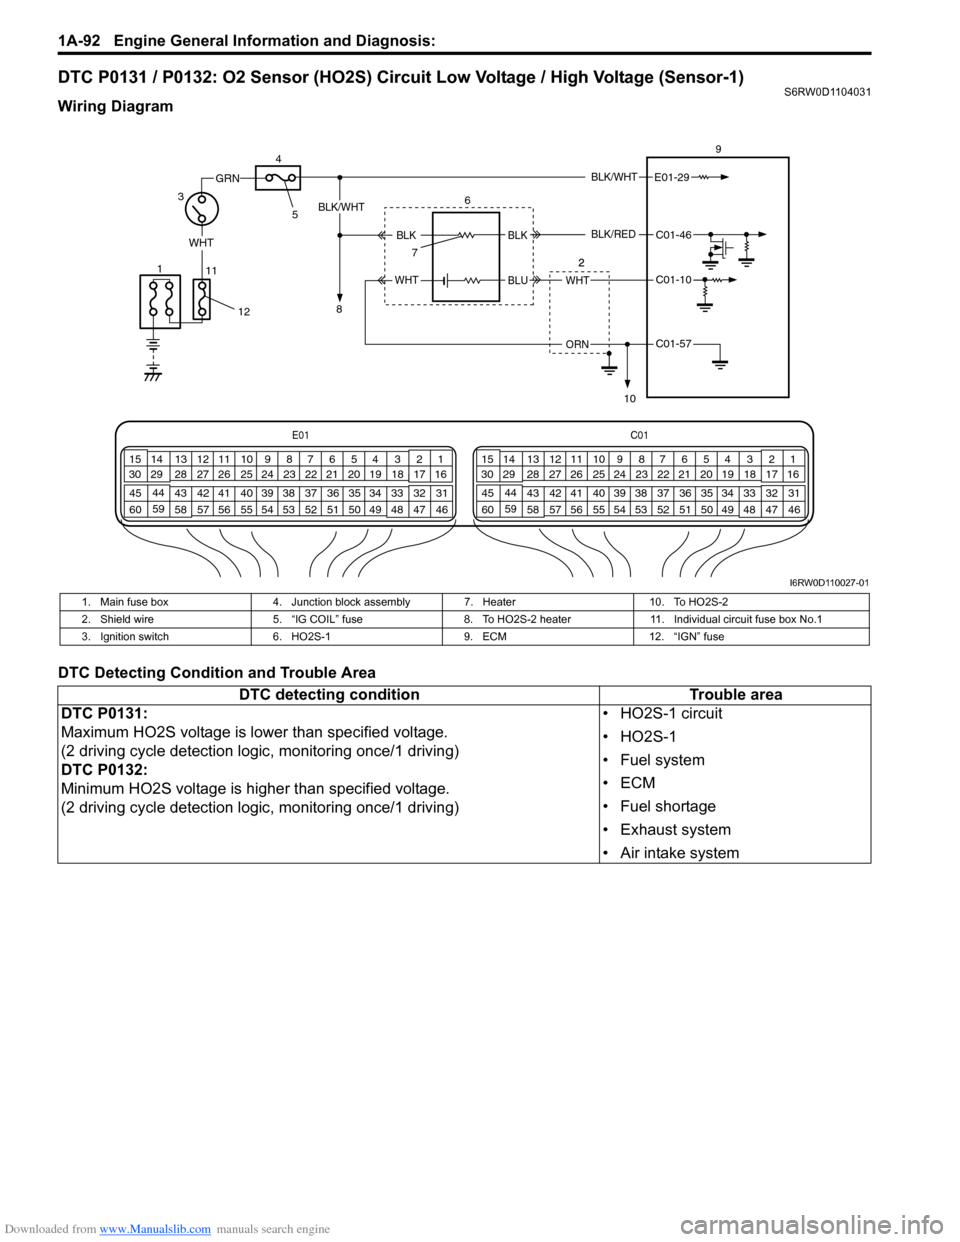 Wrg 7792 Suzuki Sx4 Fuse Box Diagram General Switch 60 2006 1g Service Workshop Manual